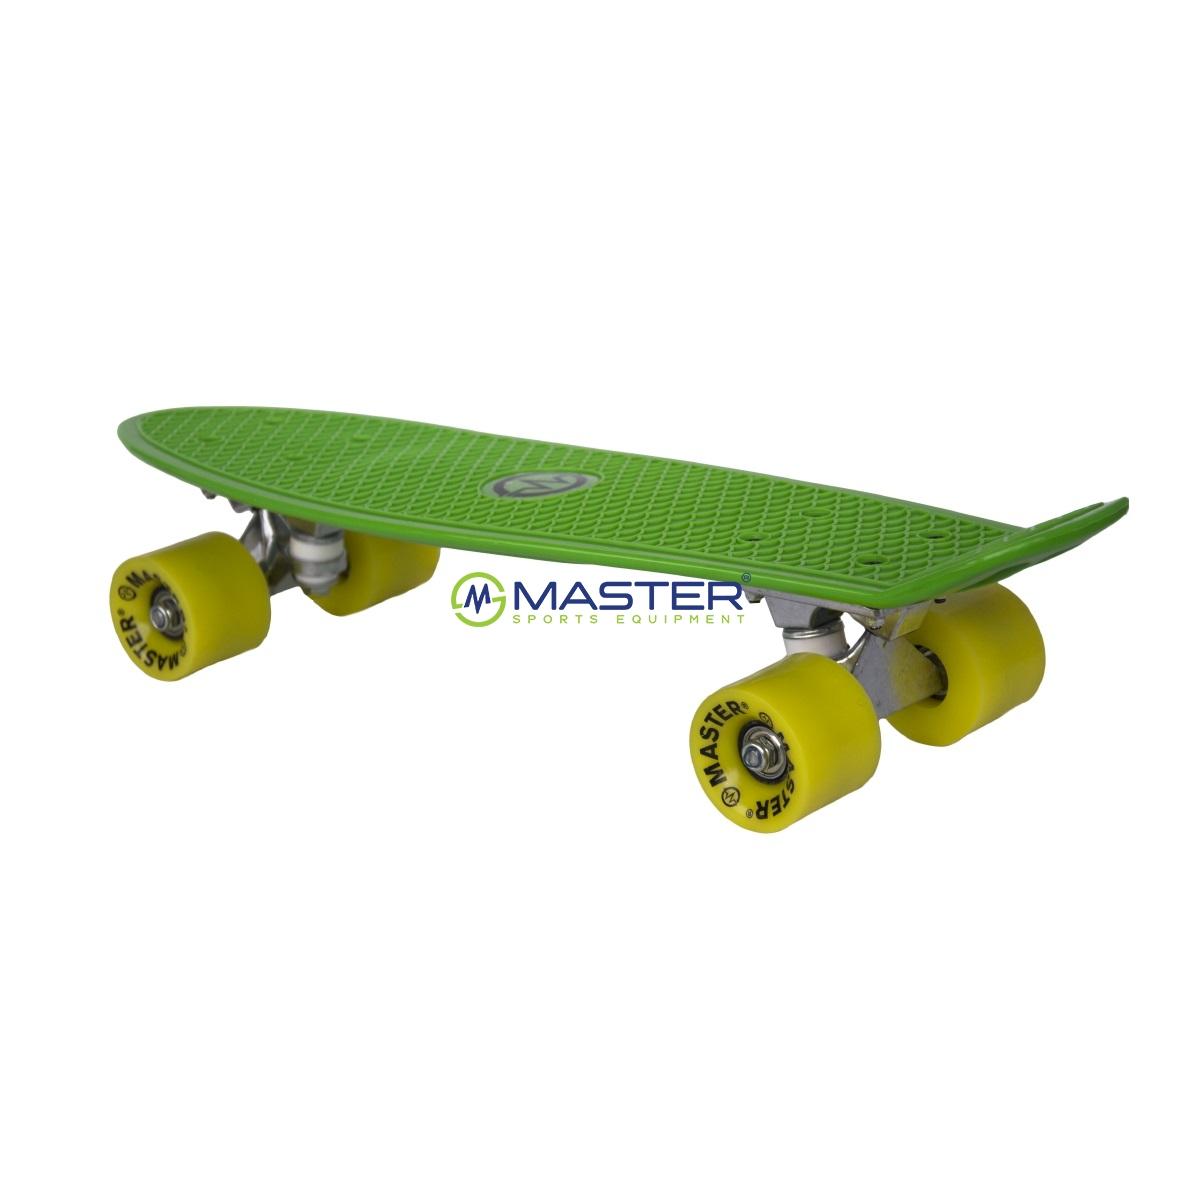 c62d33e312c Plastik Penny Board MASTER 22